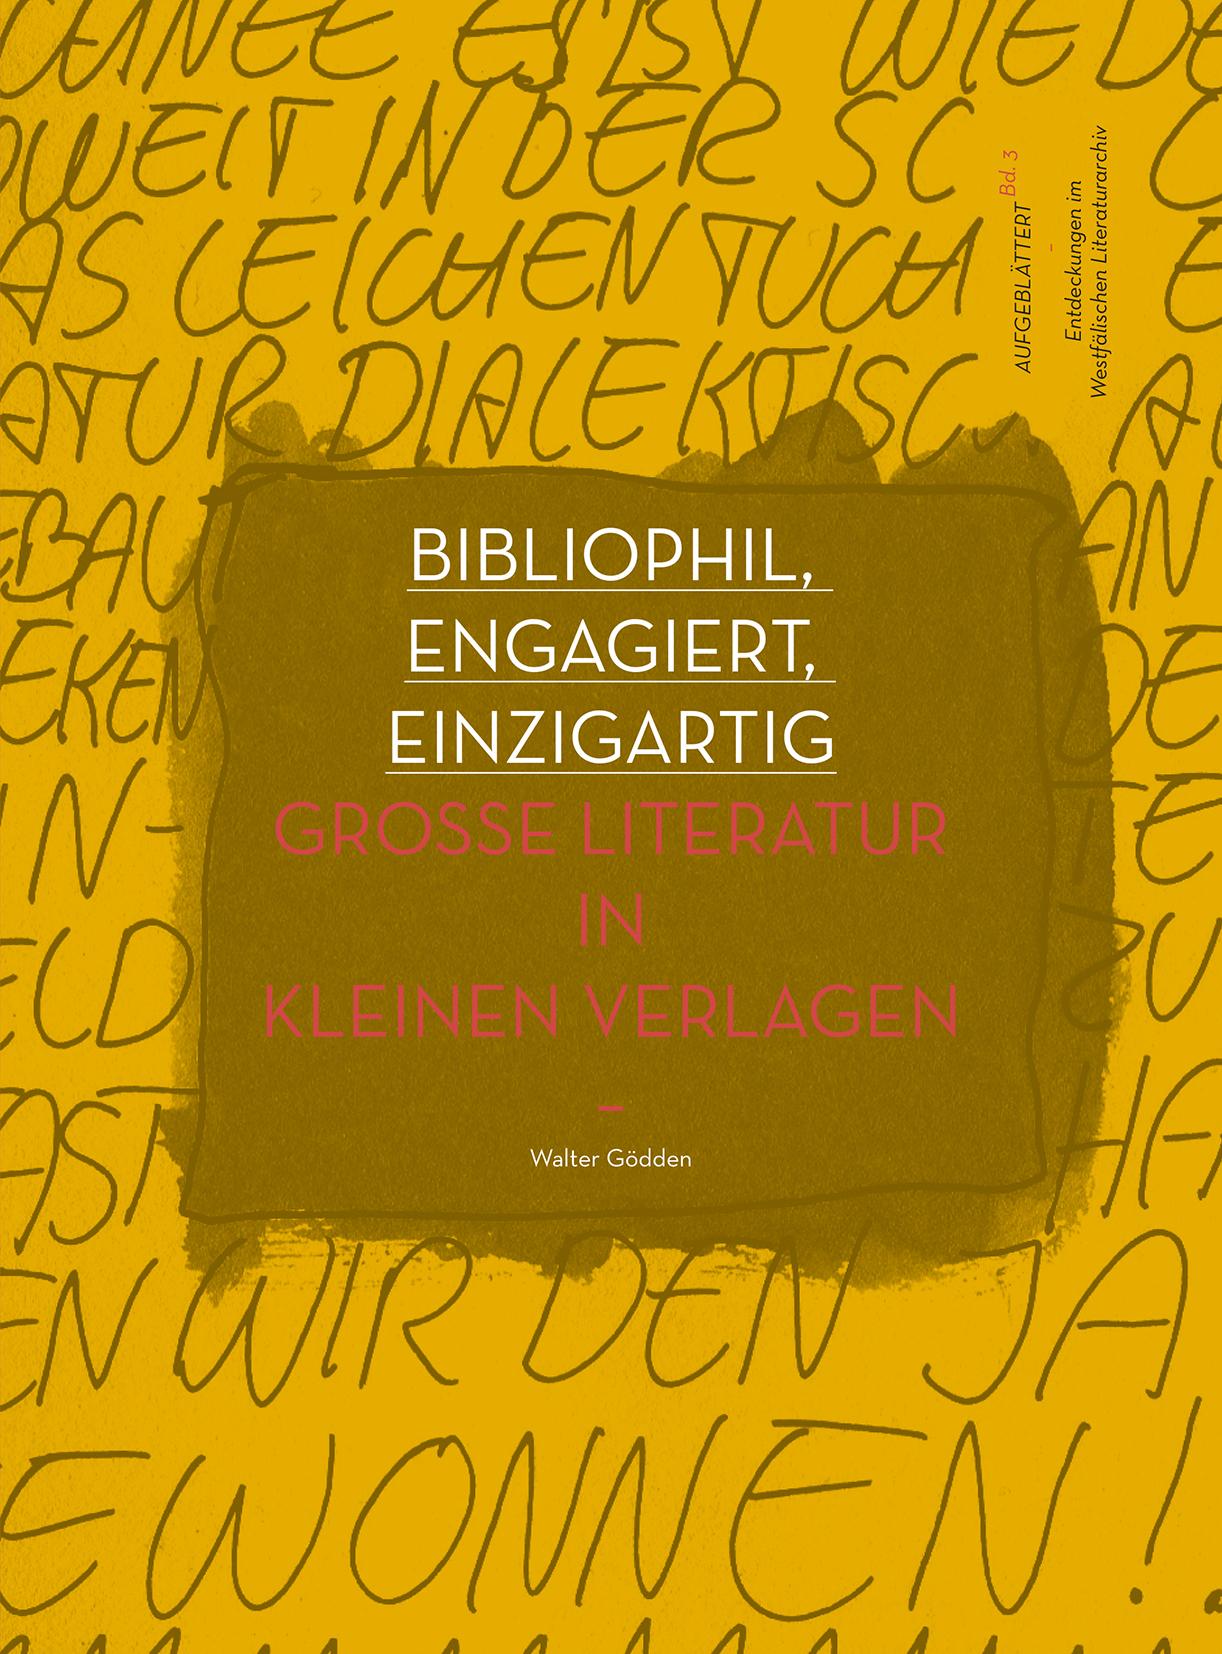 Bibliophil, engagiert, einzigartig - Walter Gödden -  9783849811259